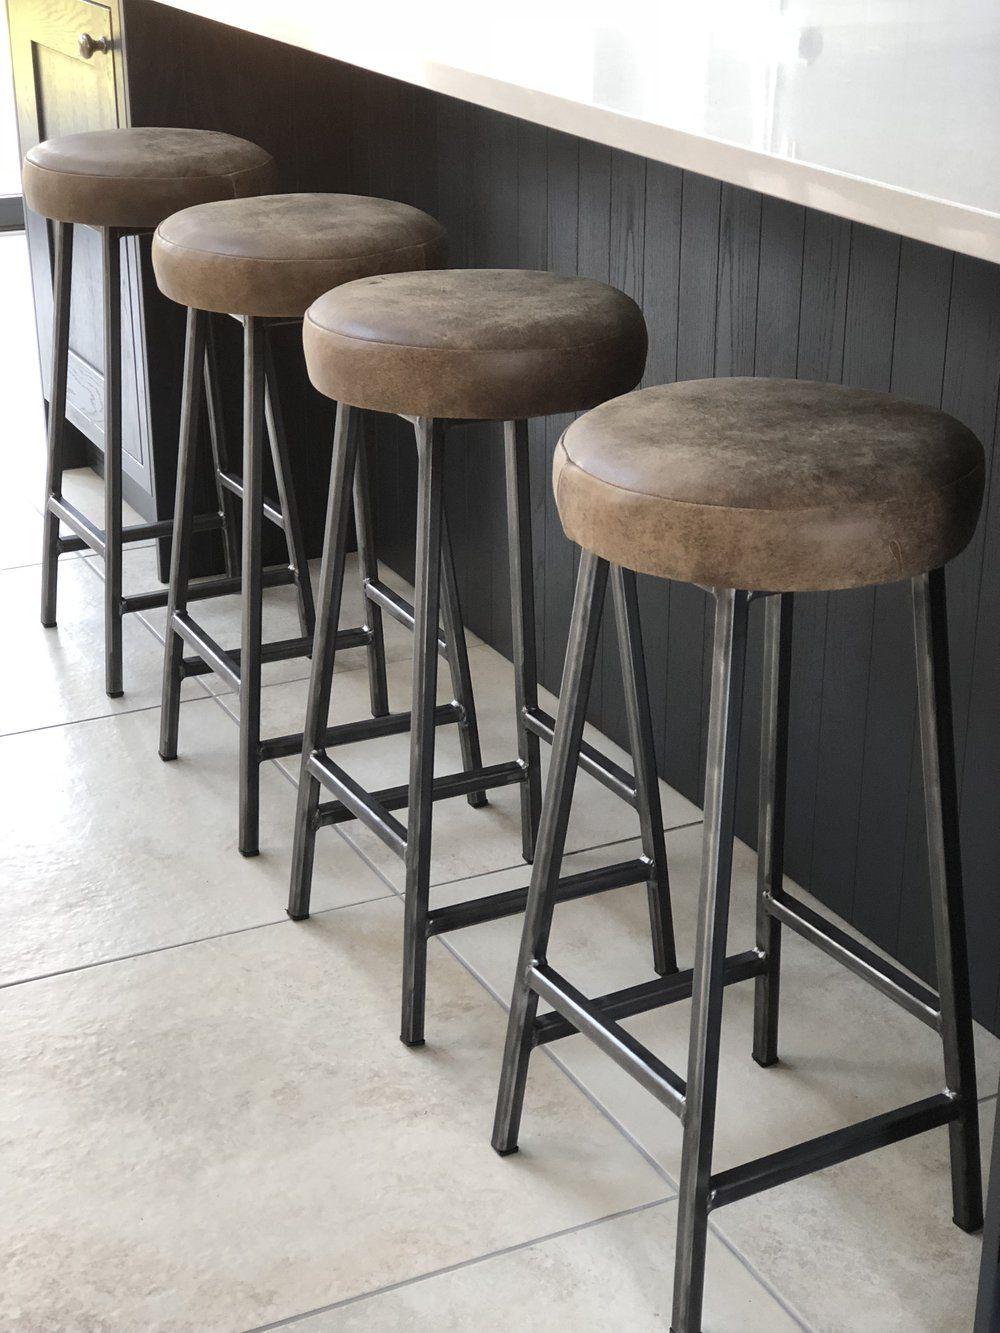 Admirable Bertie Hyde Steel Frame Industrial Bar Stool With Thick Creativecarmelina Interior Chair Design Creativecarmelinacom